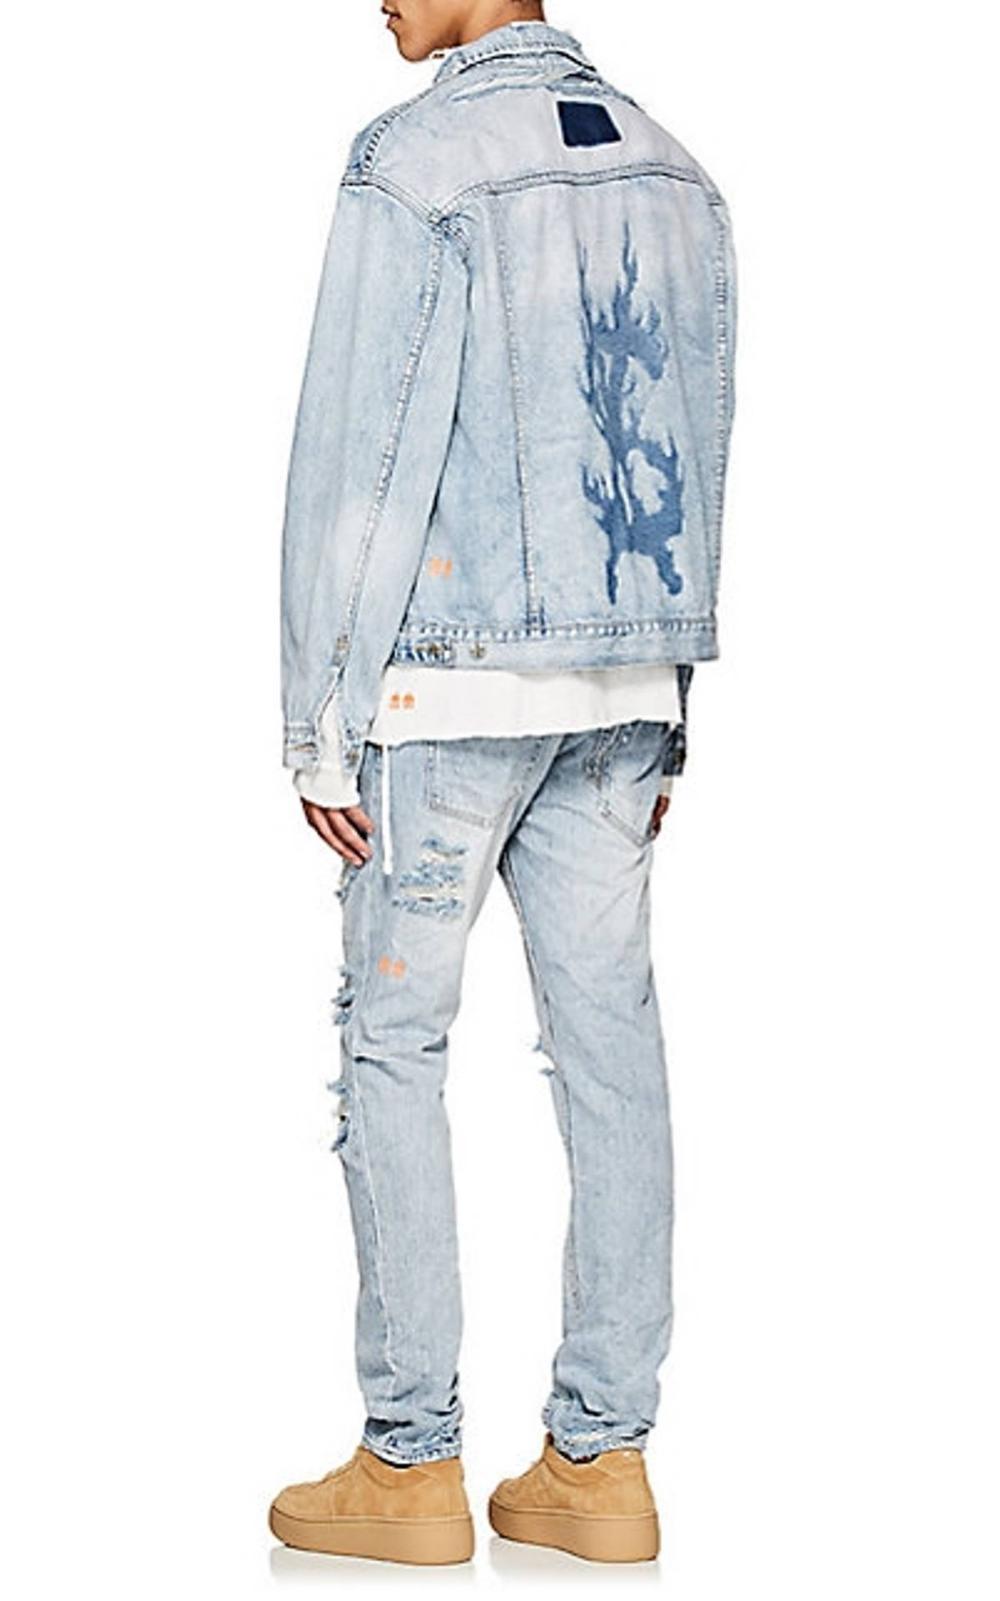 Searching For Ksubi X Travis Scott Ripped Citch Jeans We Ve Got Ksubi Bottoms Starting At 210 And Plenty Of Mens Fashion Streetwear Custom Denim Jacket Ksubi [ 1601 x 1000 Pixel ]